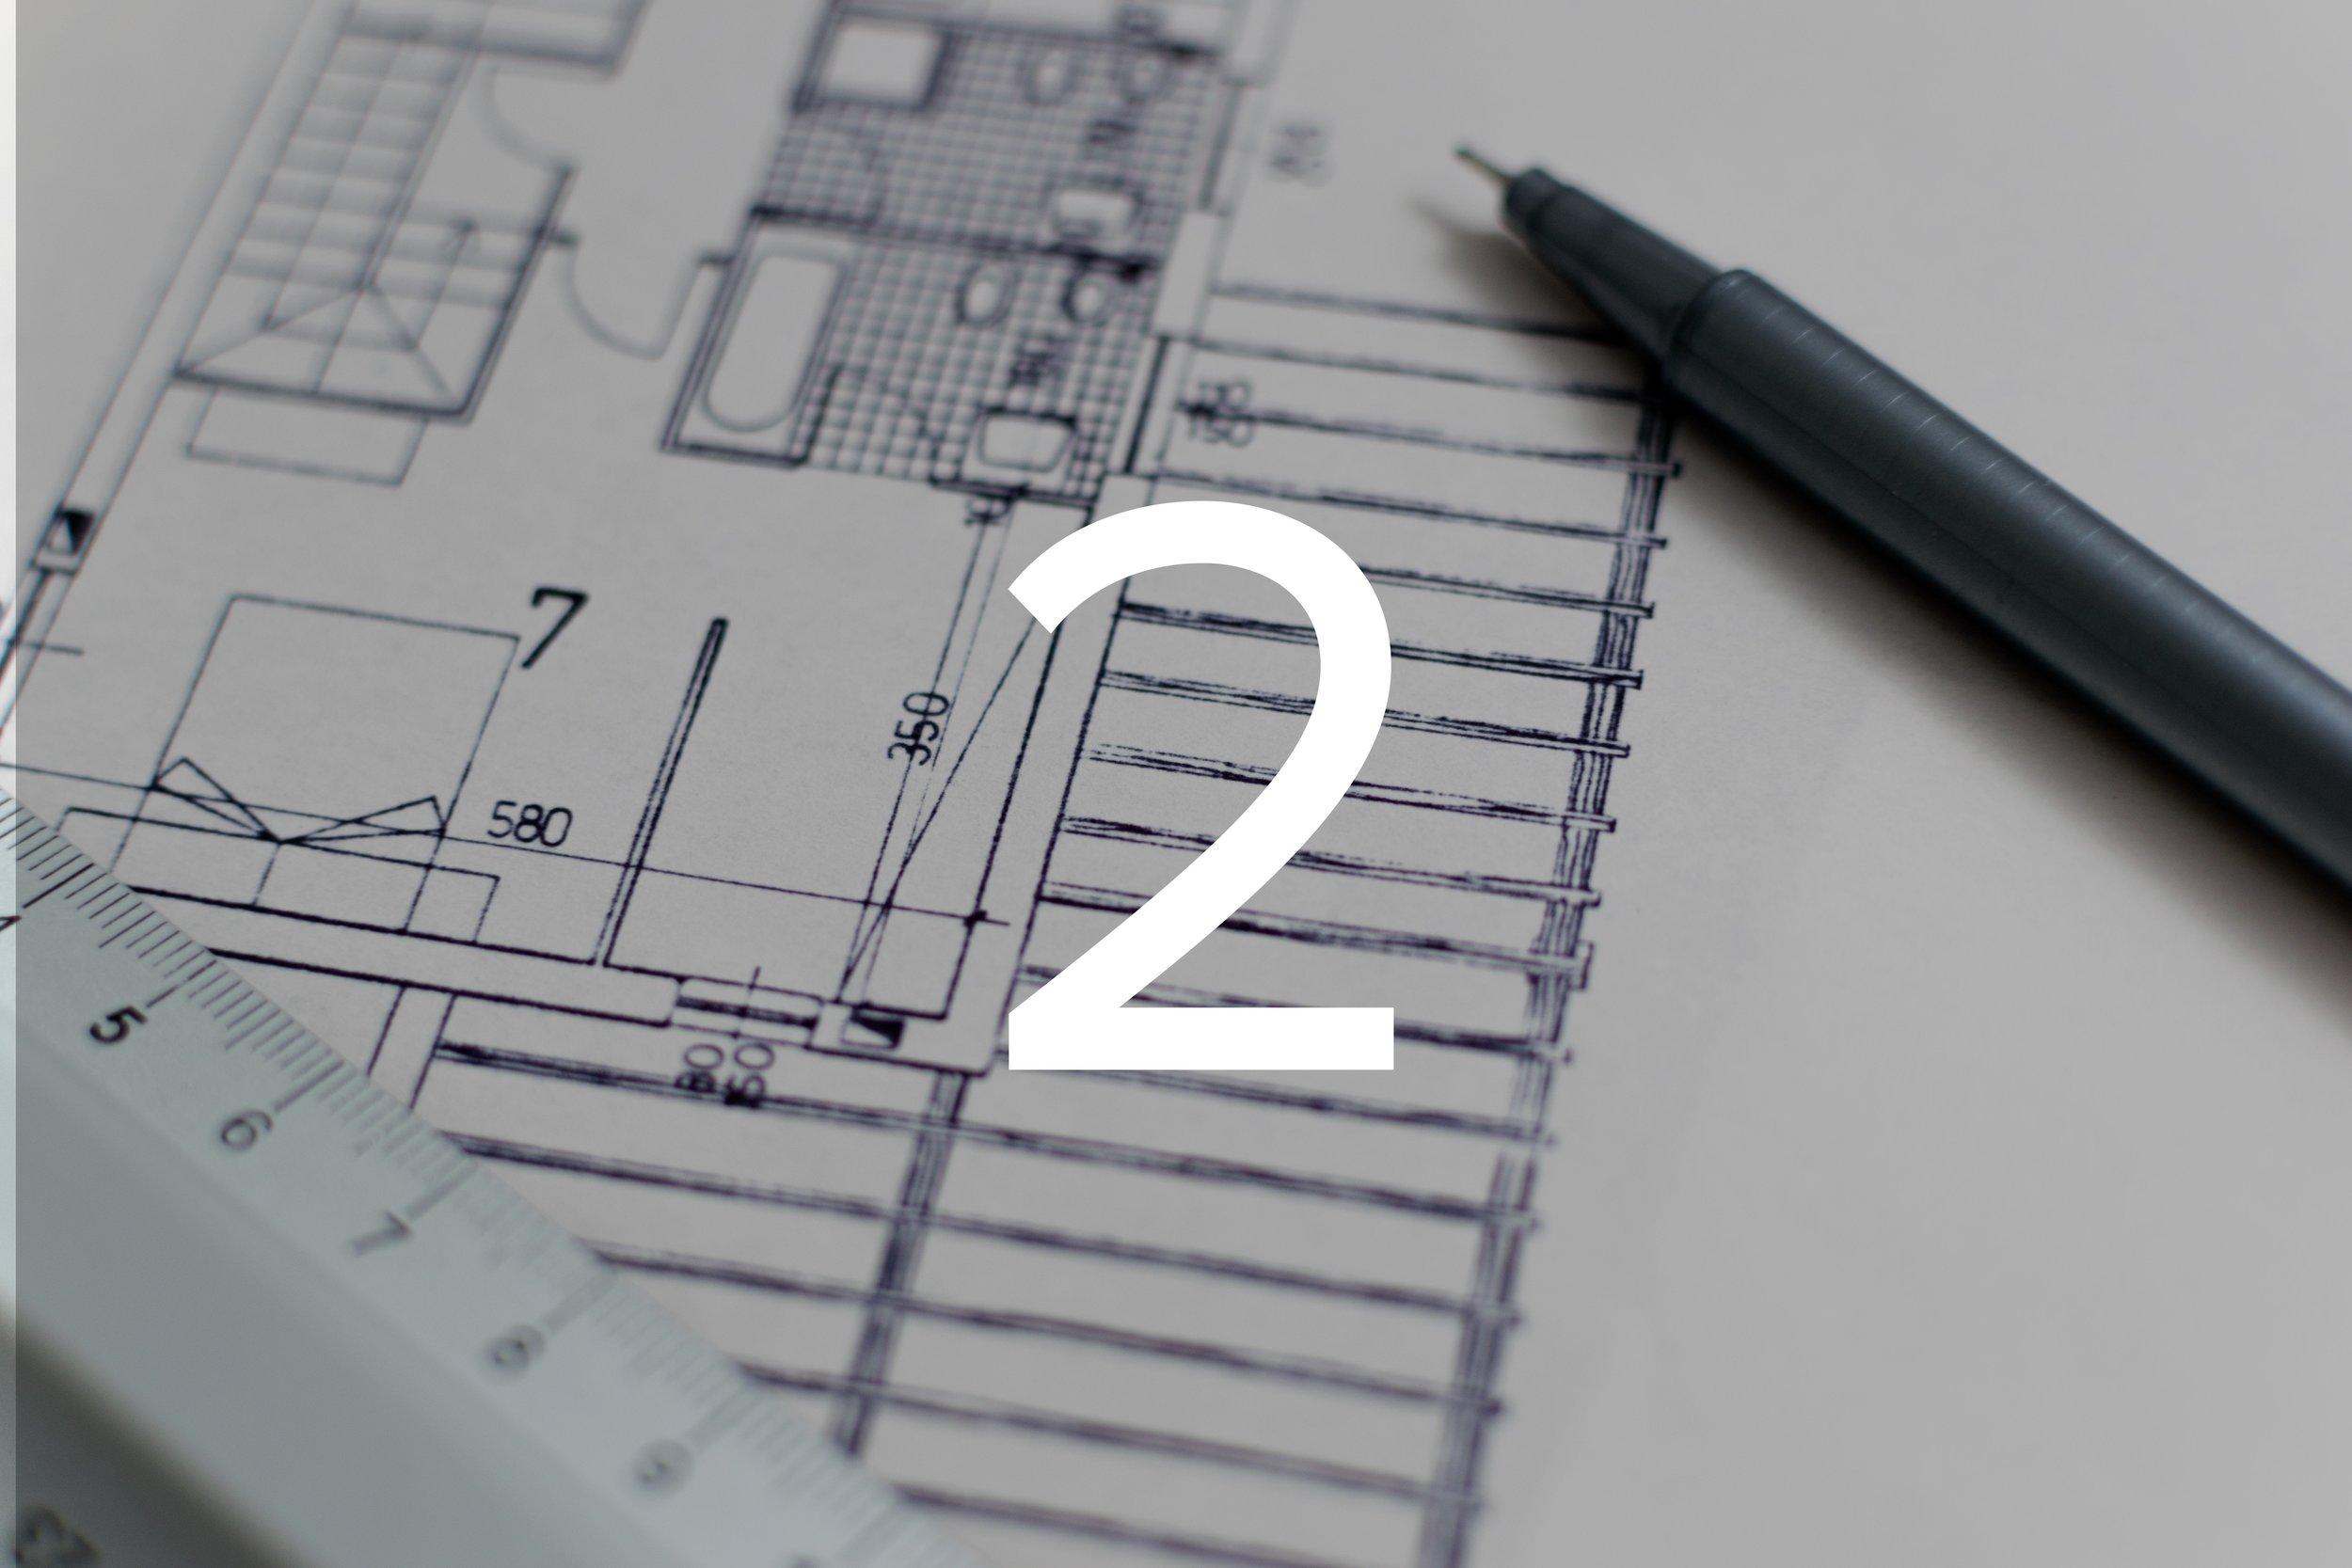 2 fdevelop plan copy.jpg